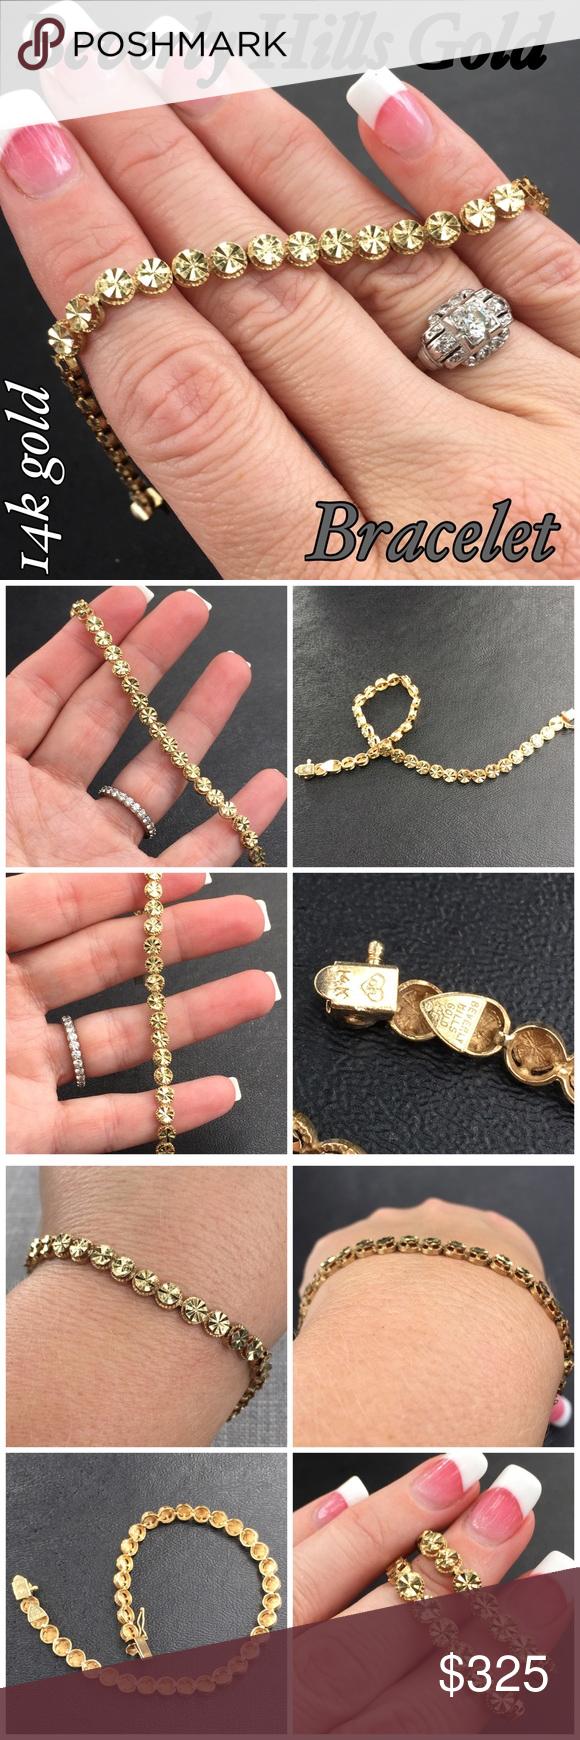 14k Beverly Hills Gold Diamond Cut 3D Bracelet Beautiful 14k Solid